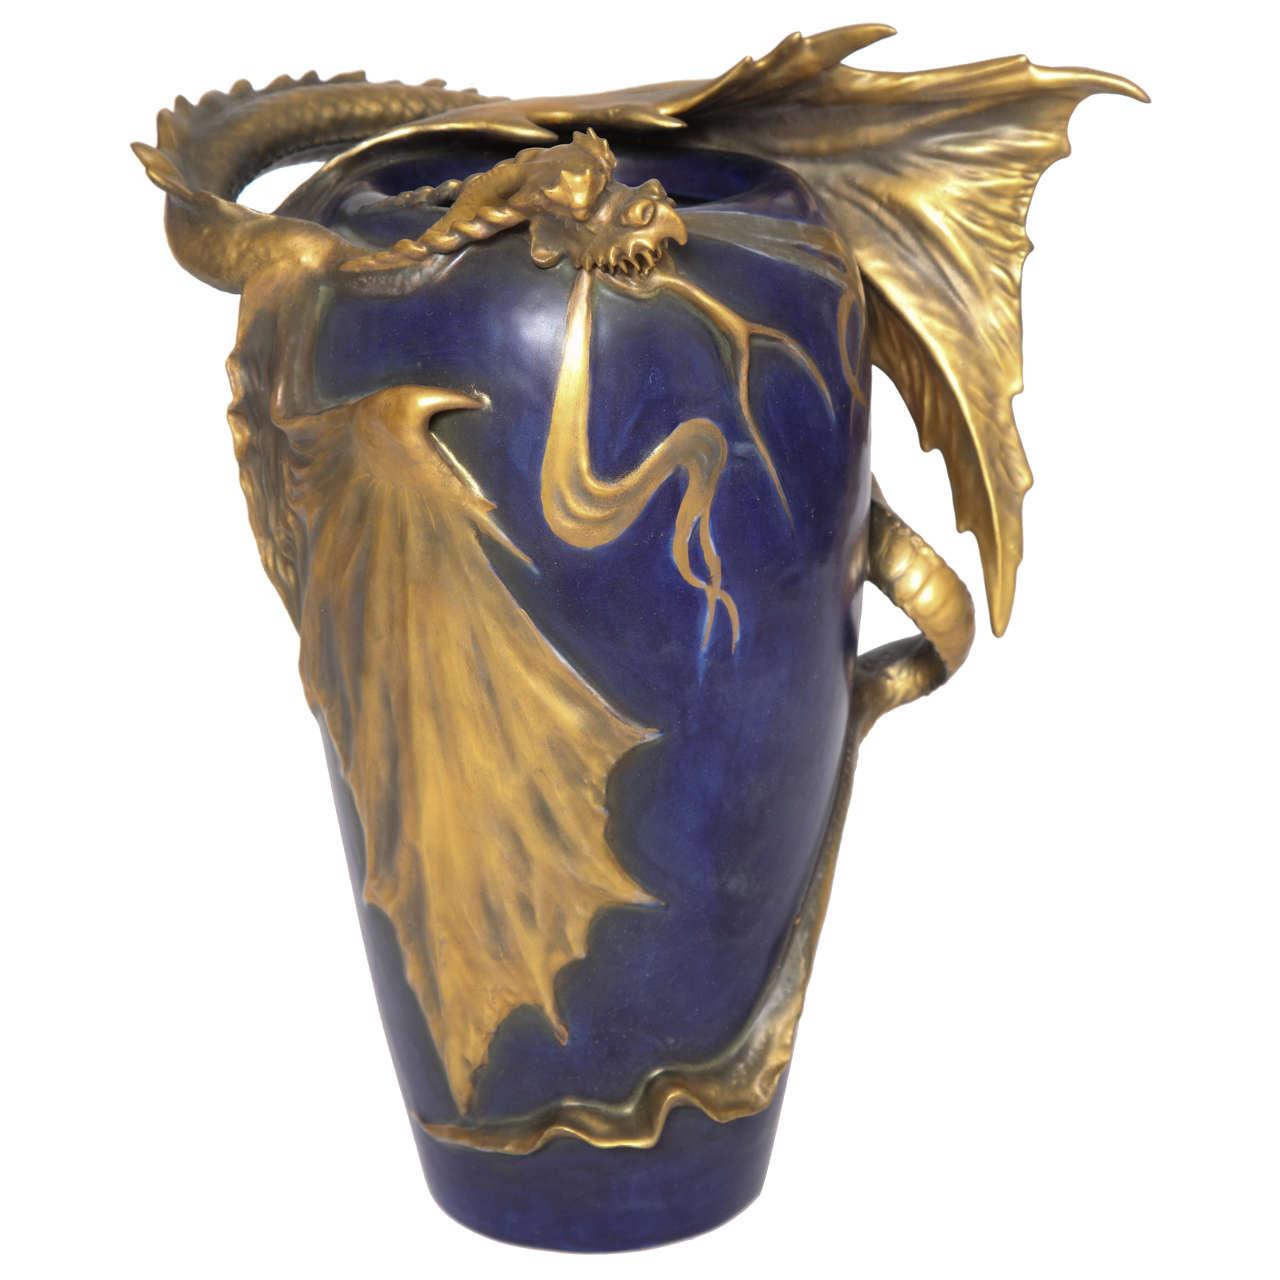 Amphora dragon vase 1900 austria for sale at 1stdibs amphora dragon vase 1900 austria for sale reviewsmspy